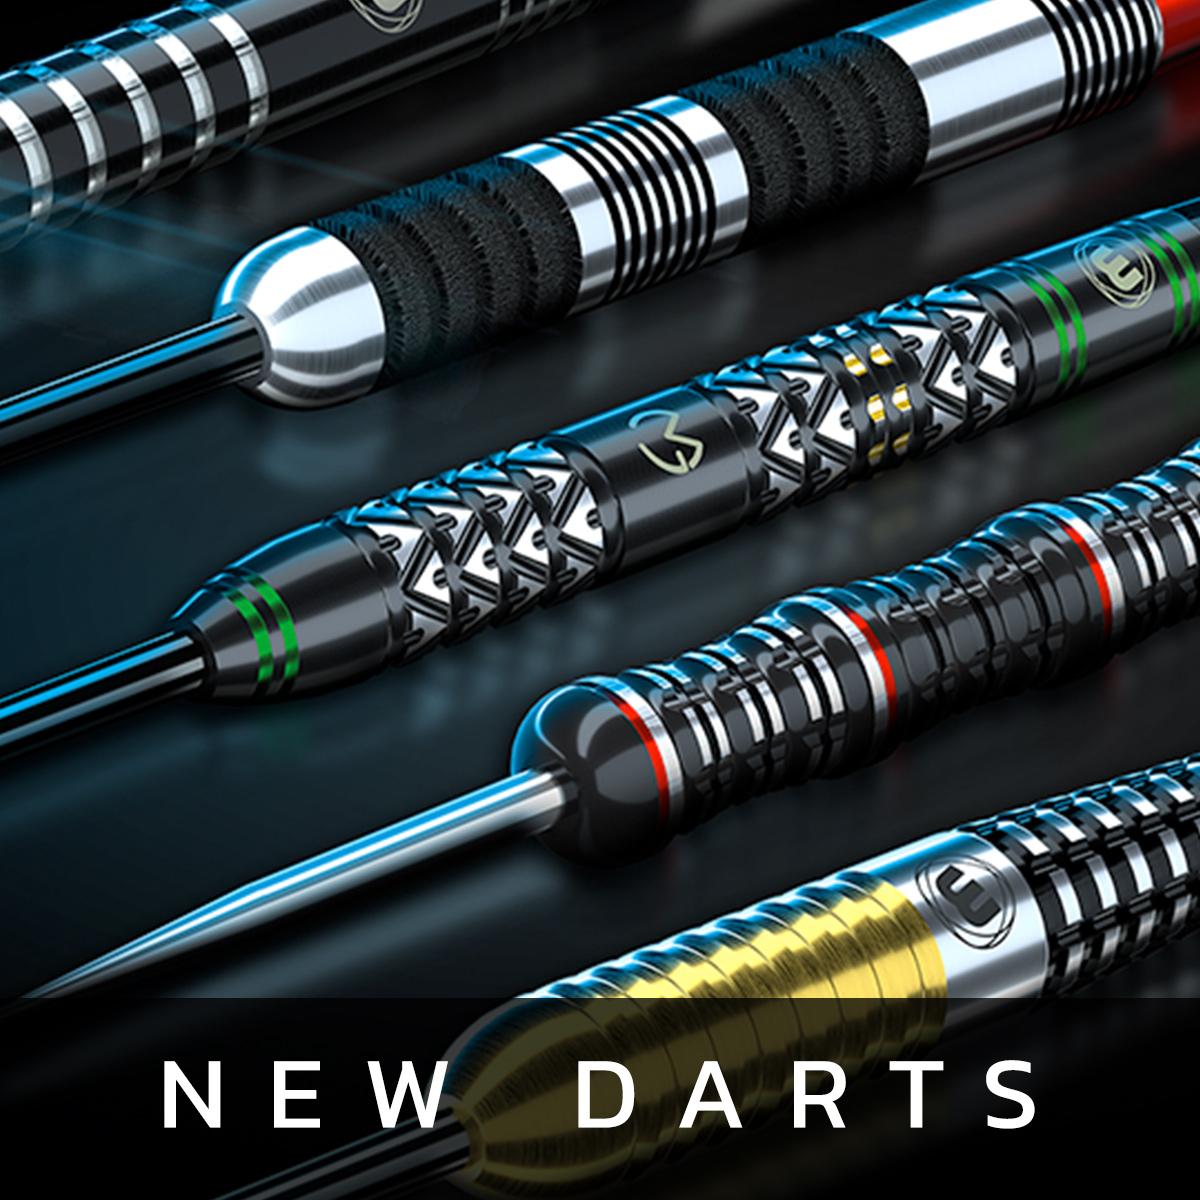 Winmau New Darts